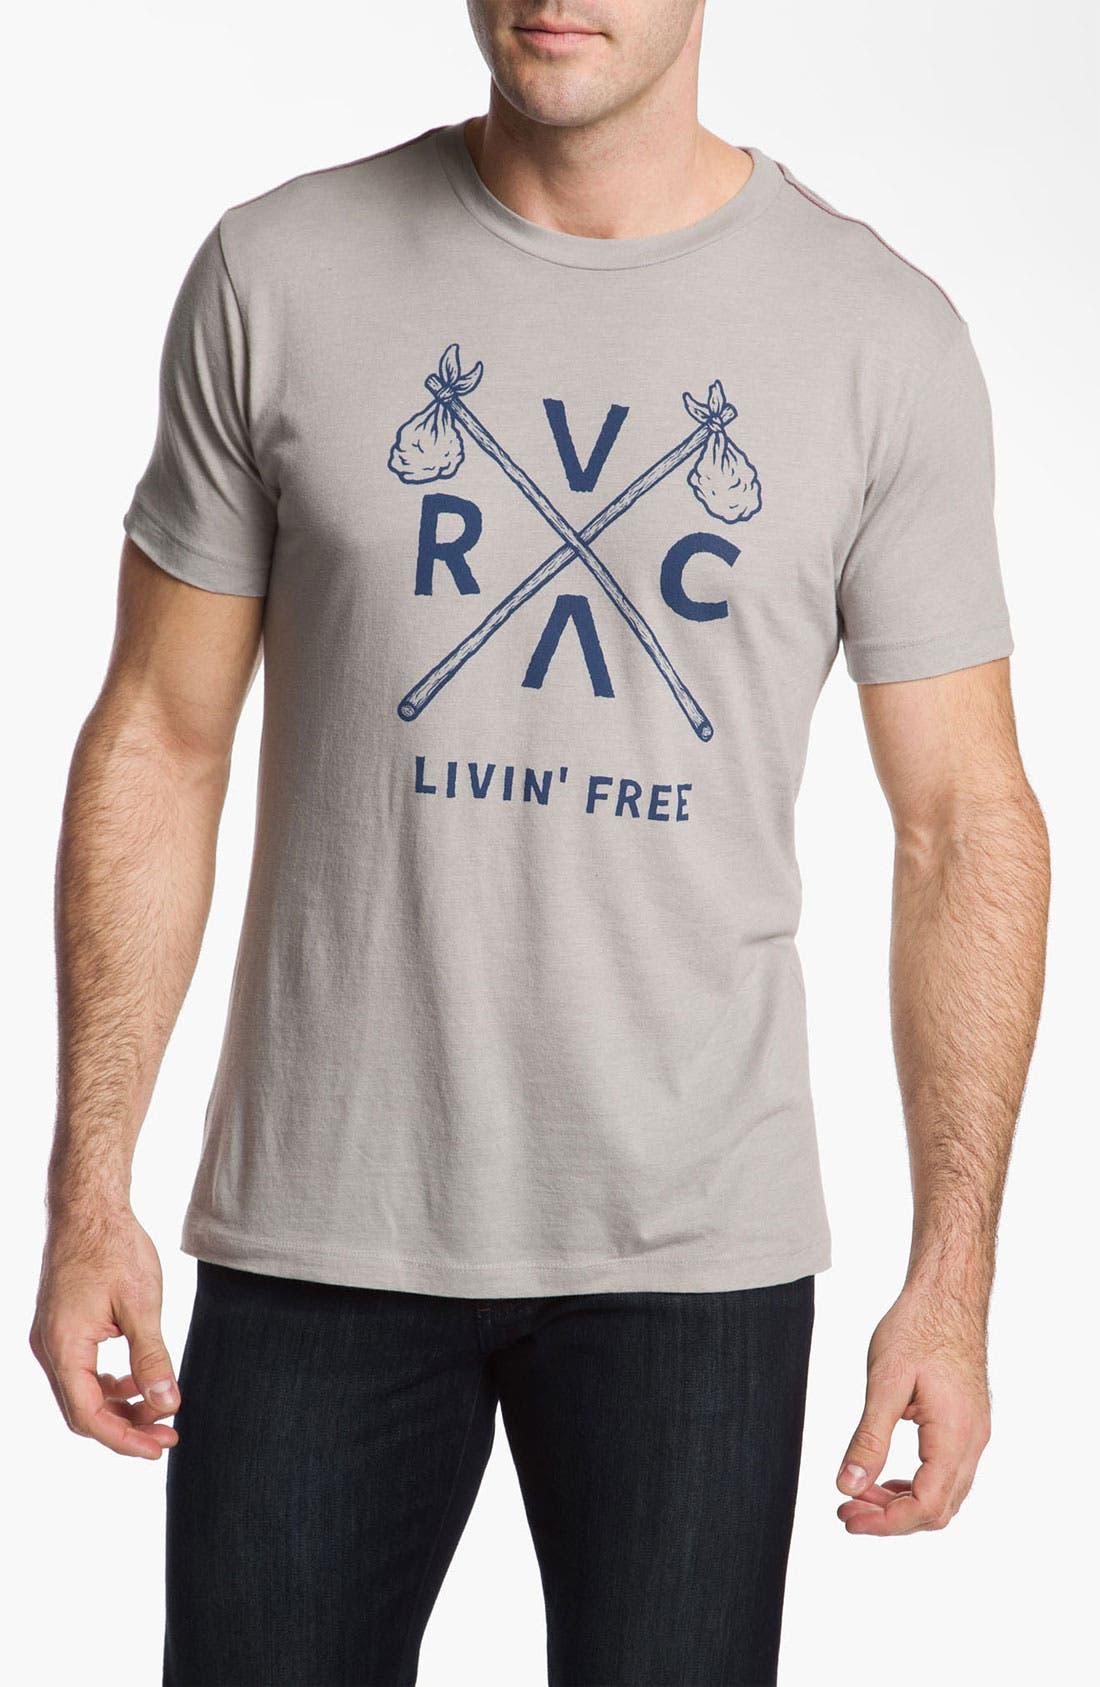 Main Image - RVCA 'Livin' Free 2' Vintage Wash T-Shirt